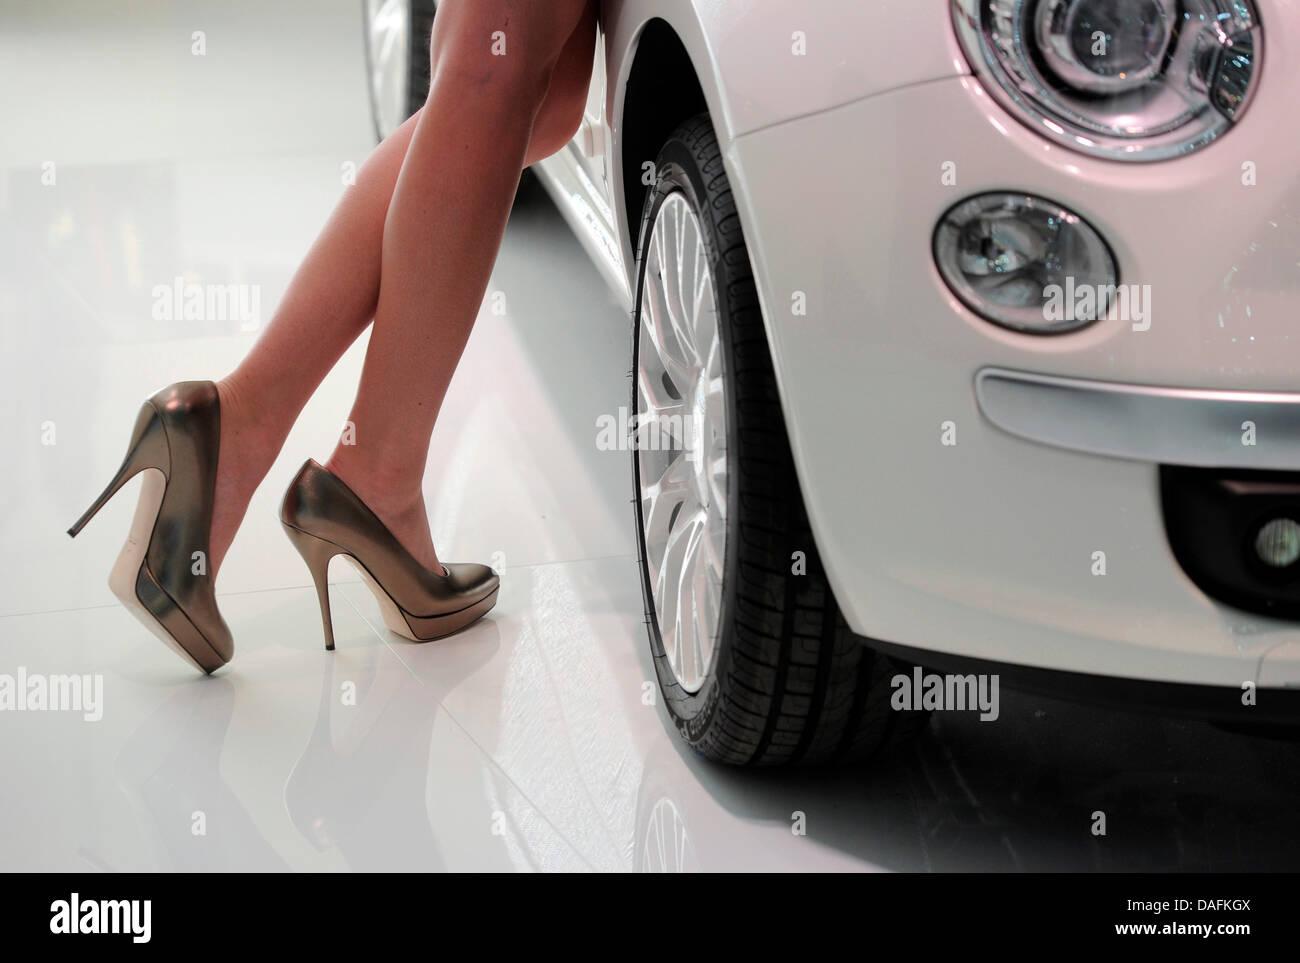 Heels Bilder High Car Alamy Stockfotosamp; XiPkOZu